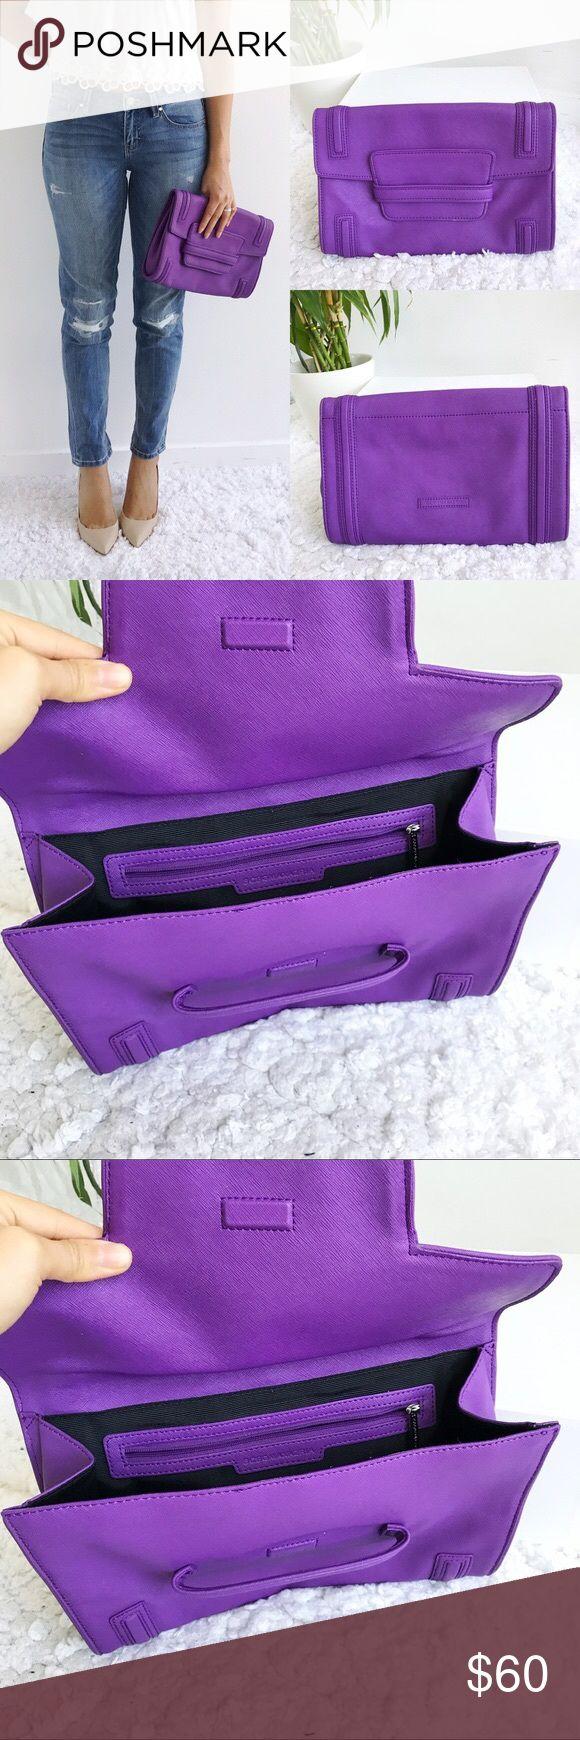 bcbgmaxazria 💜purple 💜Clutch bcbgmaxazria 💜purple 💜Clutch BCBGMaxAzria Bags Clutches & Wristlets